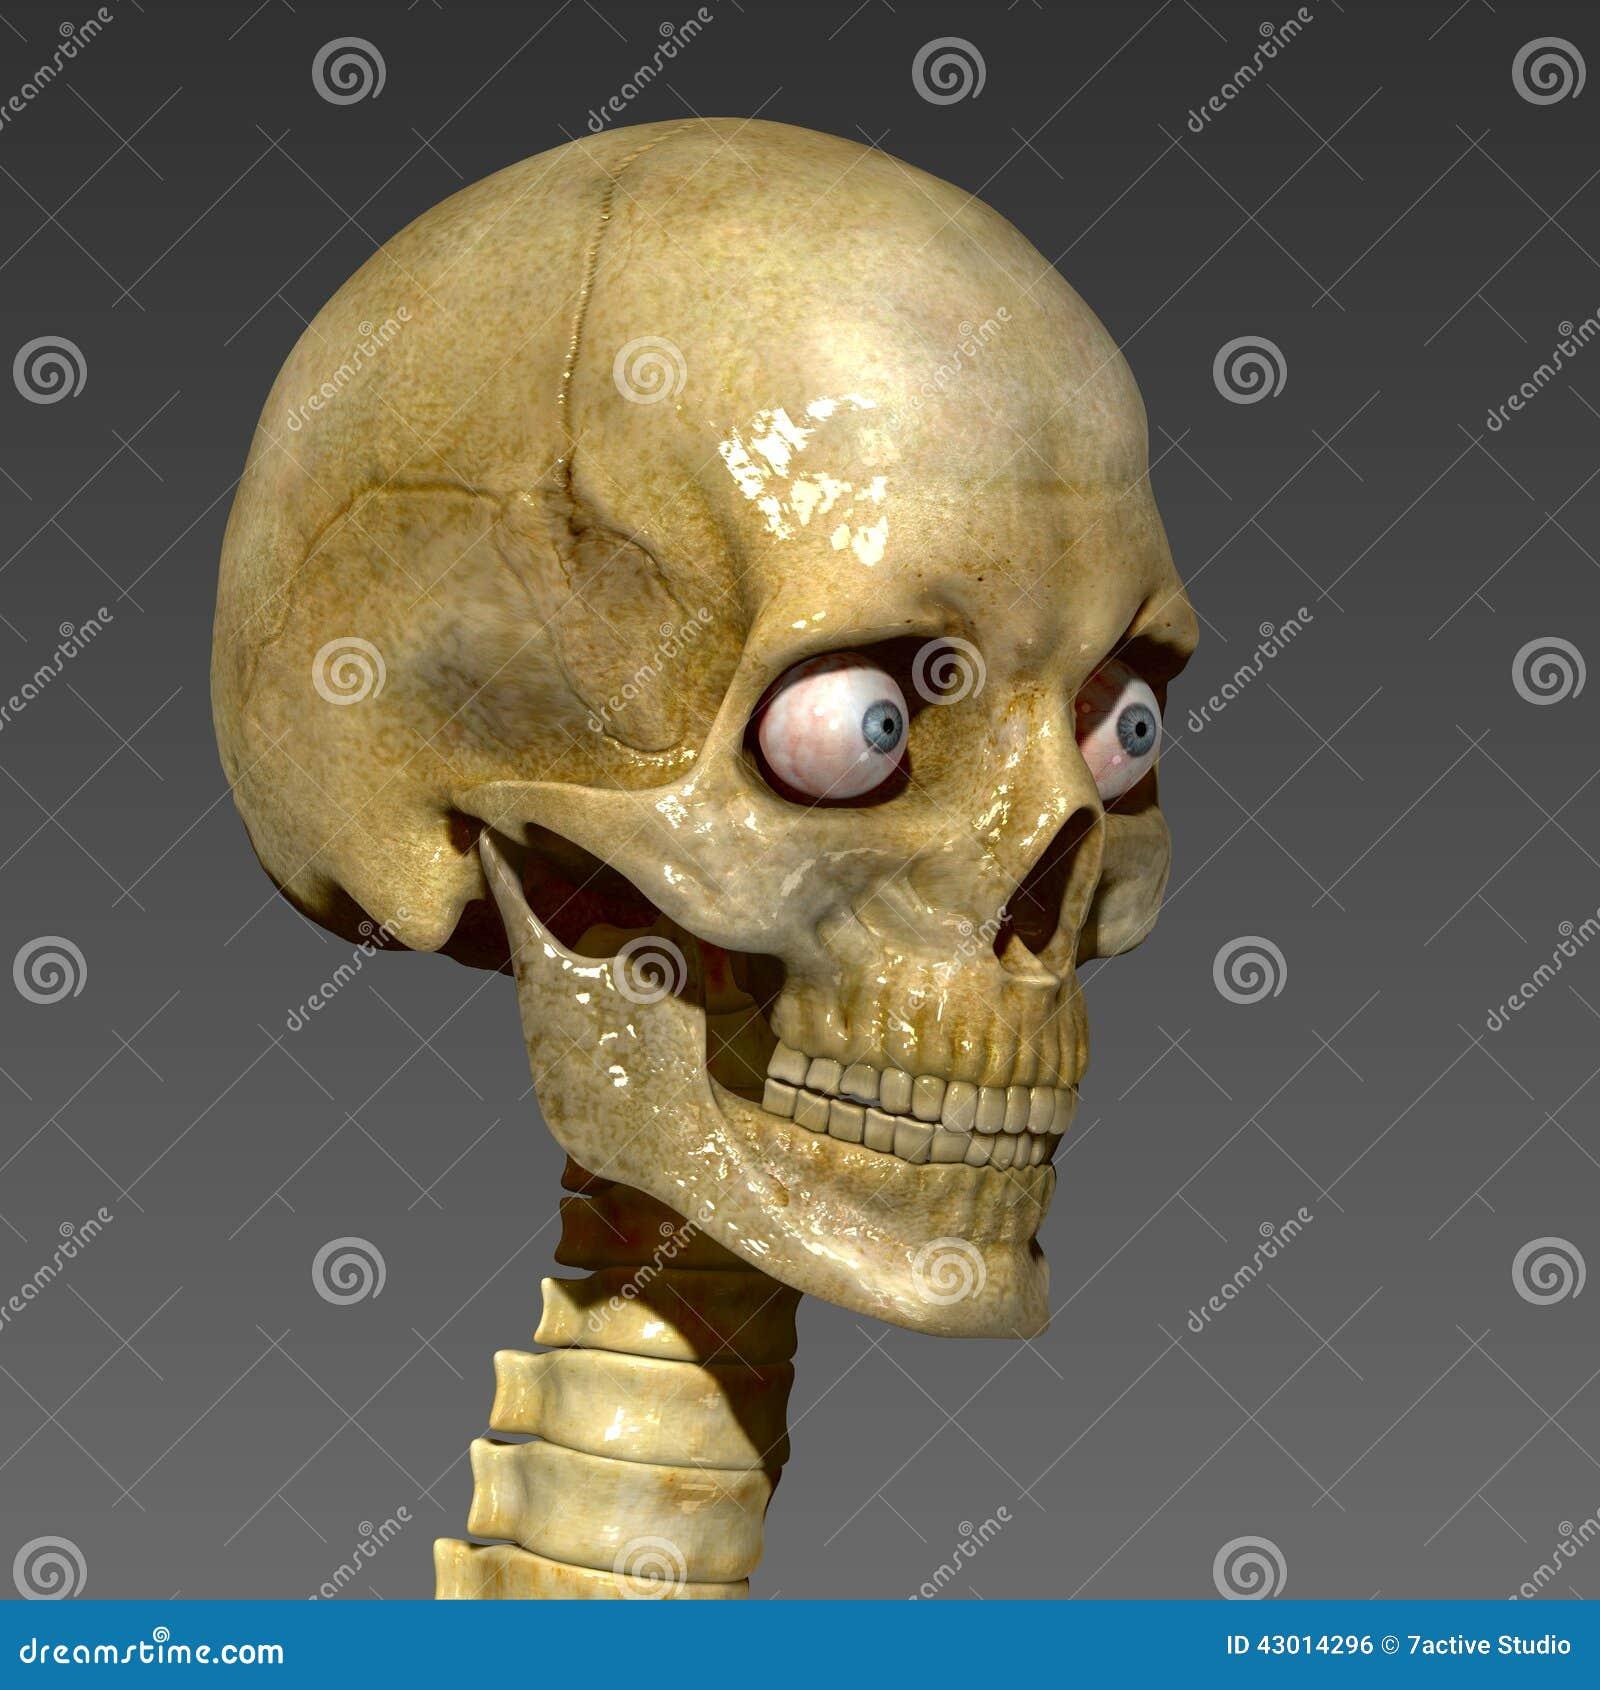 human skull stock photo - image: 43014296, Skeleton